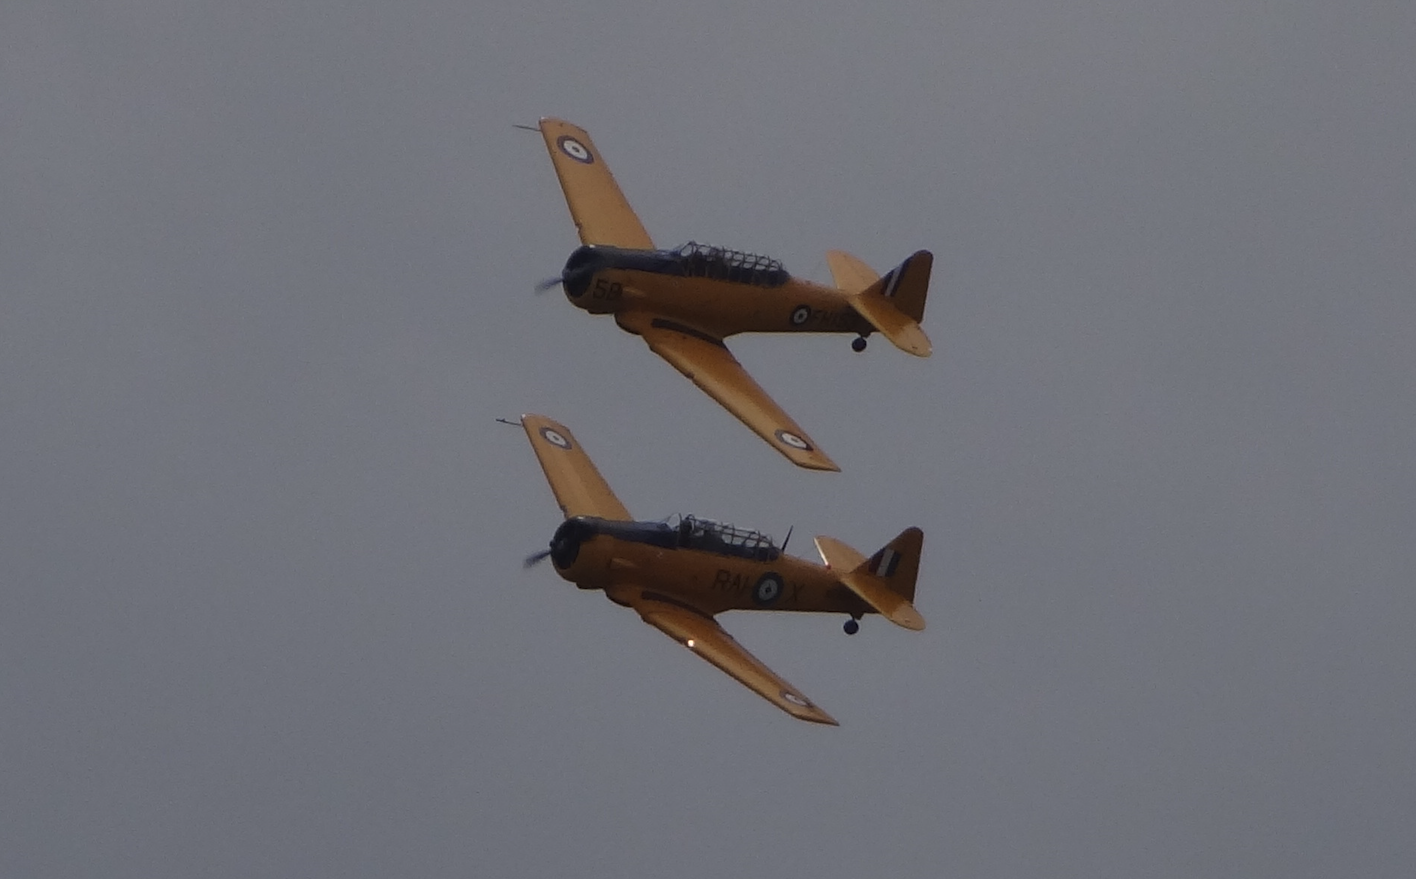 North American AT-16 Harvard IIB nb FH-153/58 and North American T-6 Harvard 4M (RAI-X) nb KF-584. 2018. Photo by Karol Placha Hetman